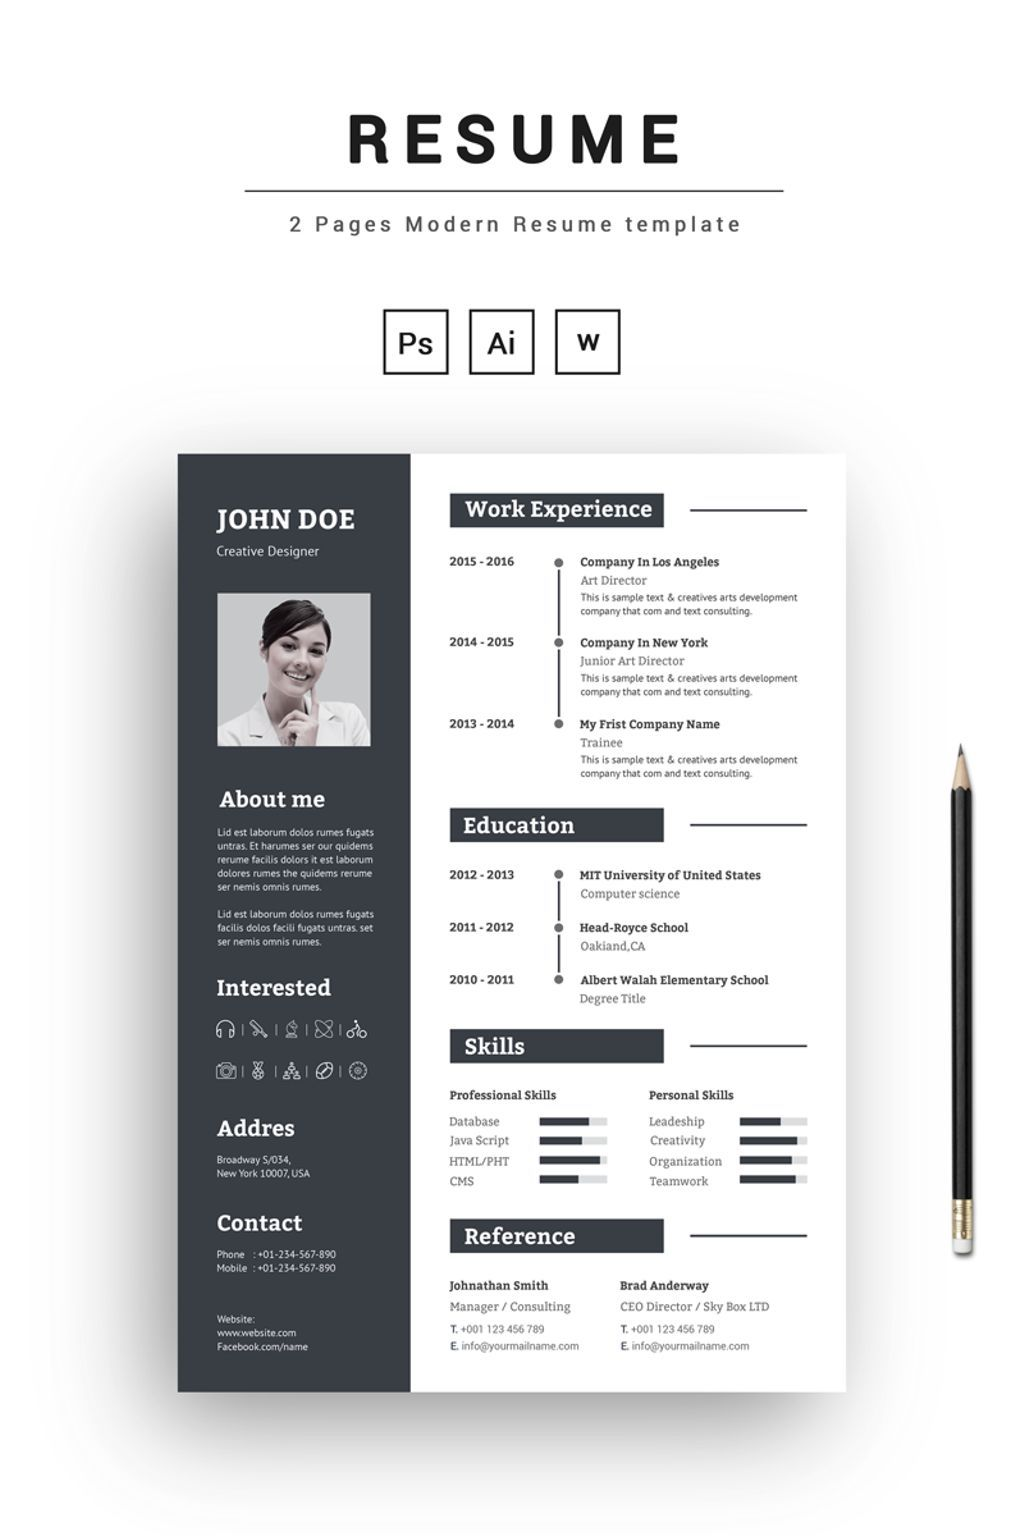 2 Pages Modern Resume Template Resume Resumetemplate Cvtemplate Cv Cvdesign Resumedesign Https Www Templatemonster Desain Cv Cv Kreatif Desain Resume